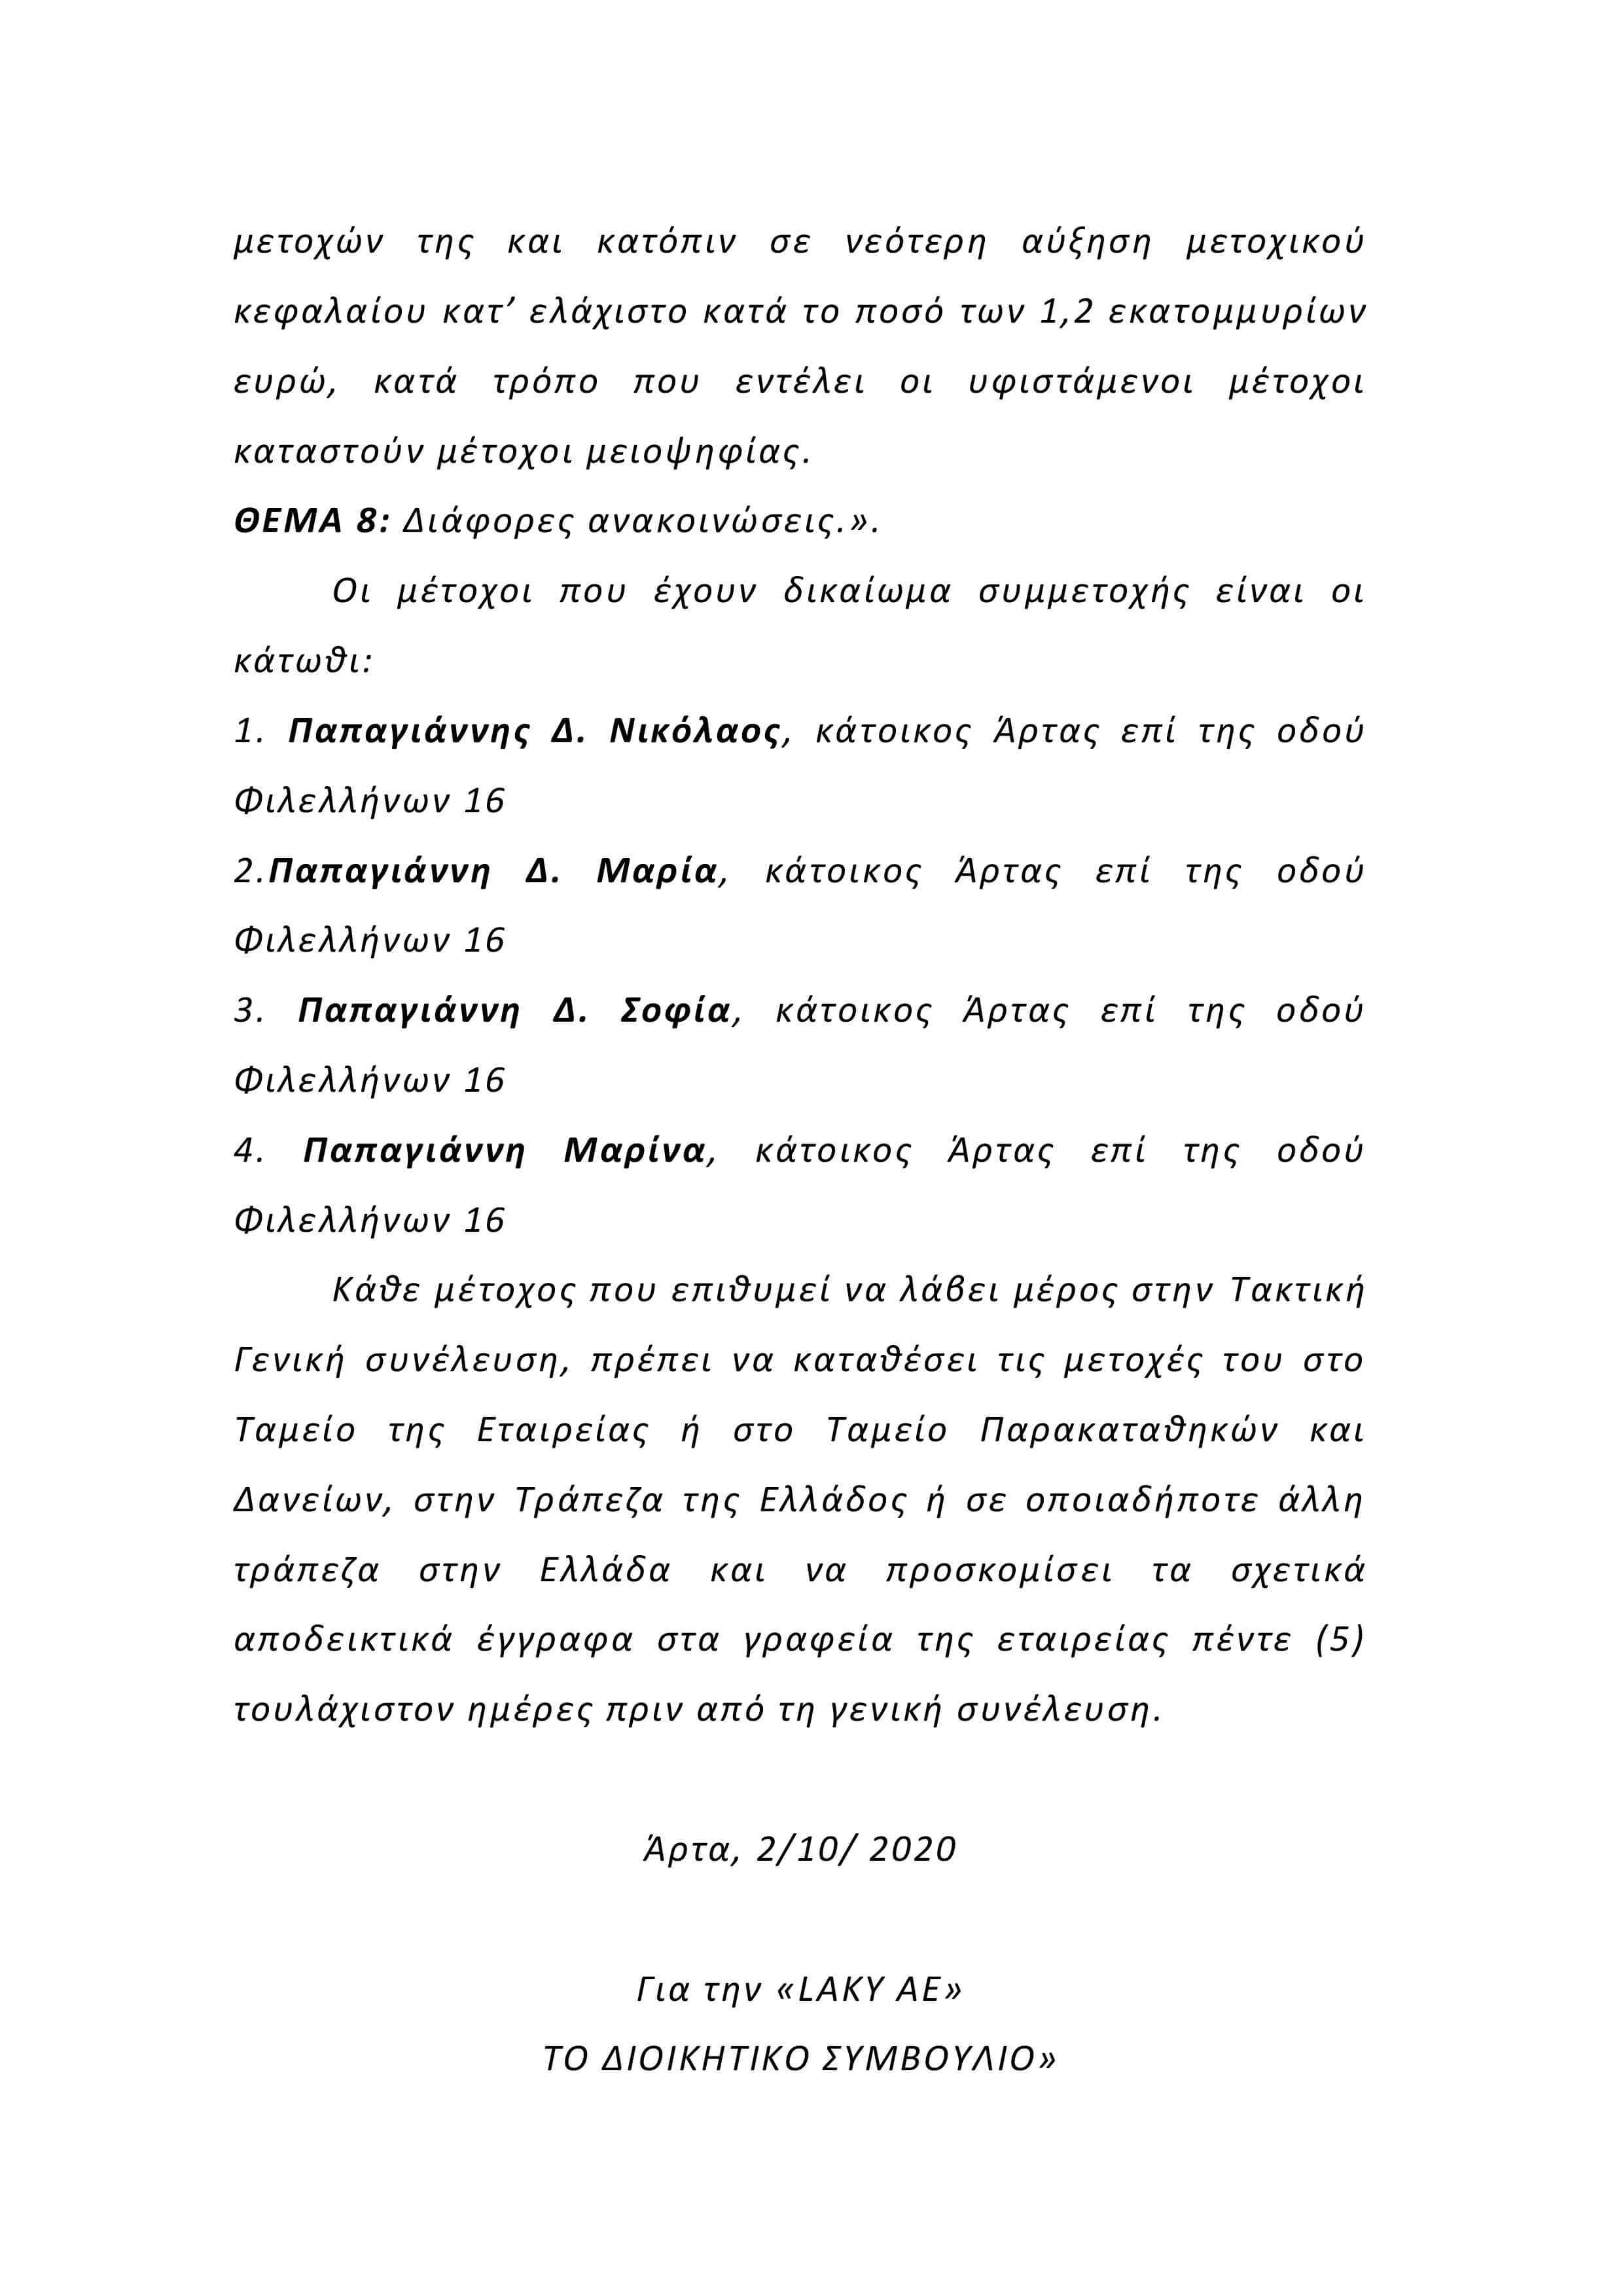 P201 ΔΣ LAKY 10-2020 ΠΡΟΣΚΛΗΣΗ-4